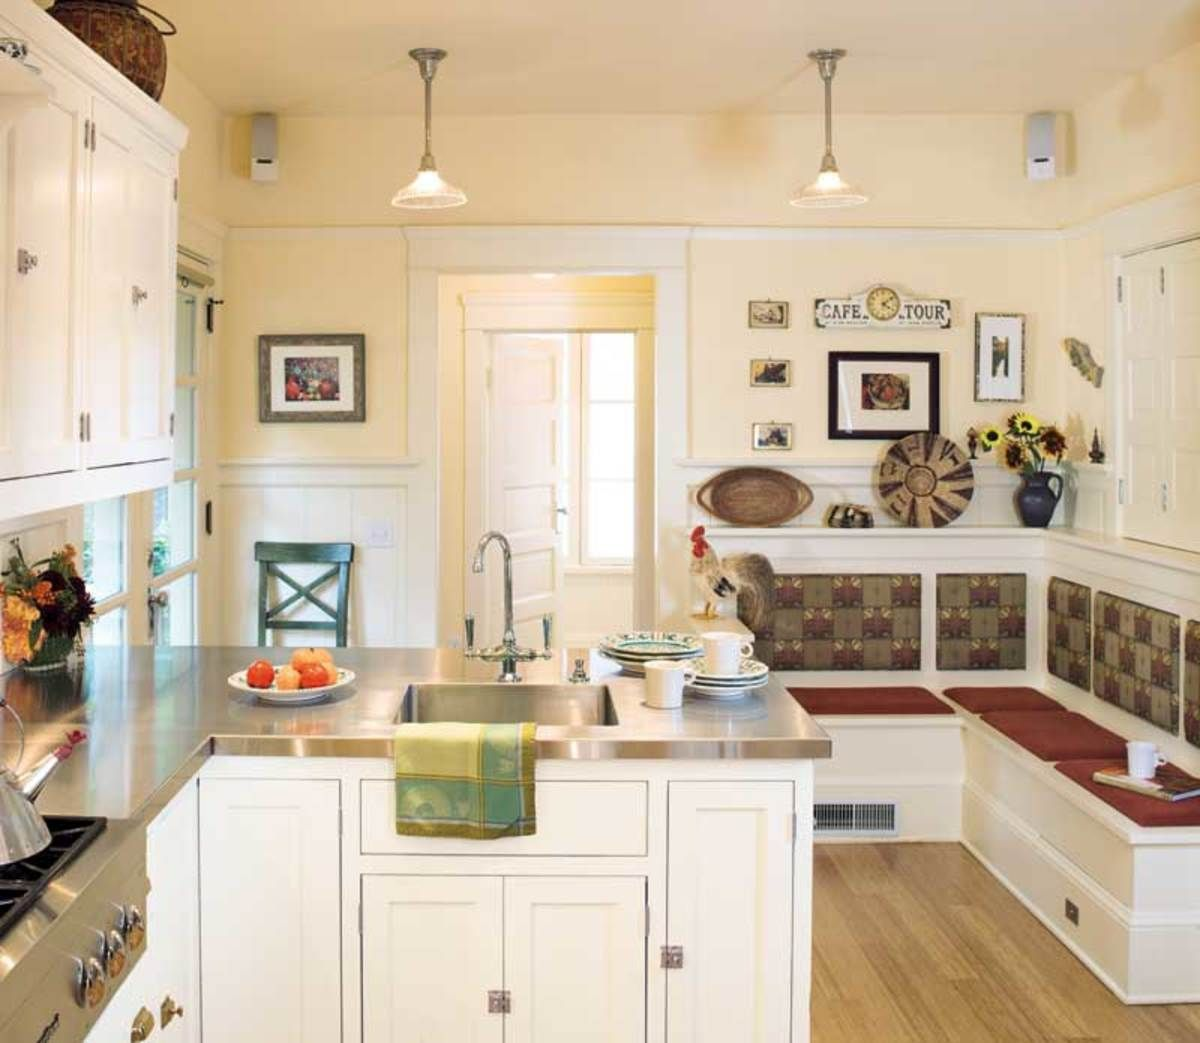 The eraus white kitchens were interpreted for this oregon foursquare